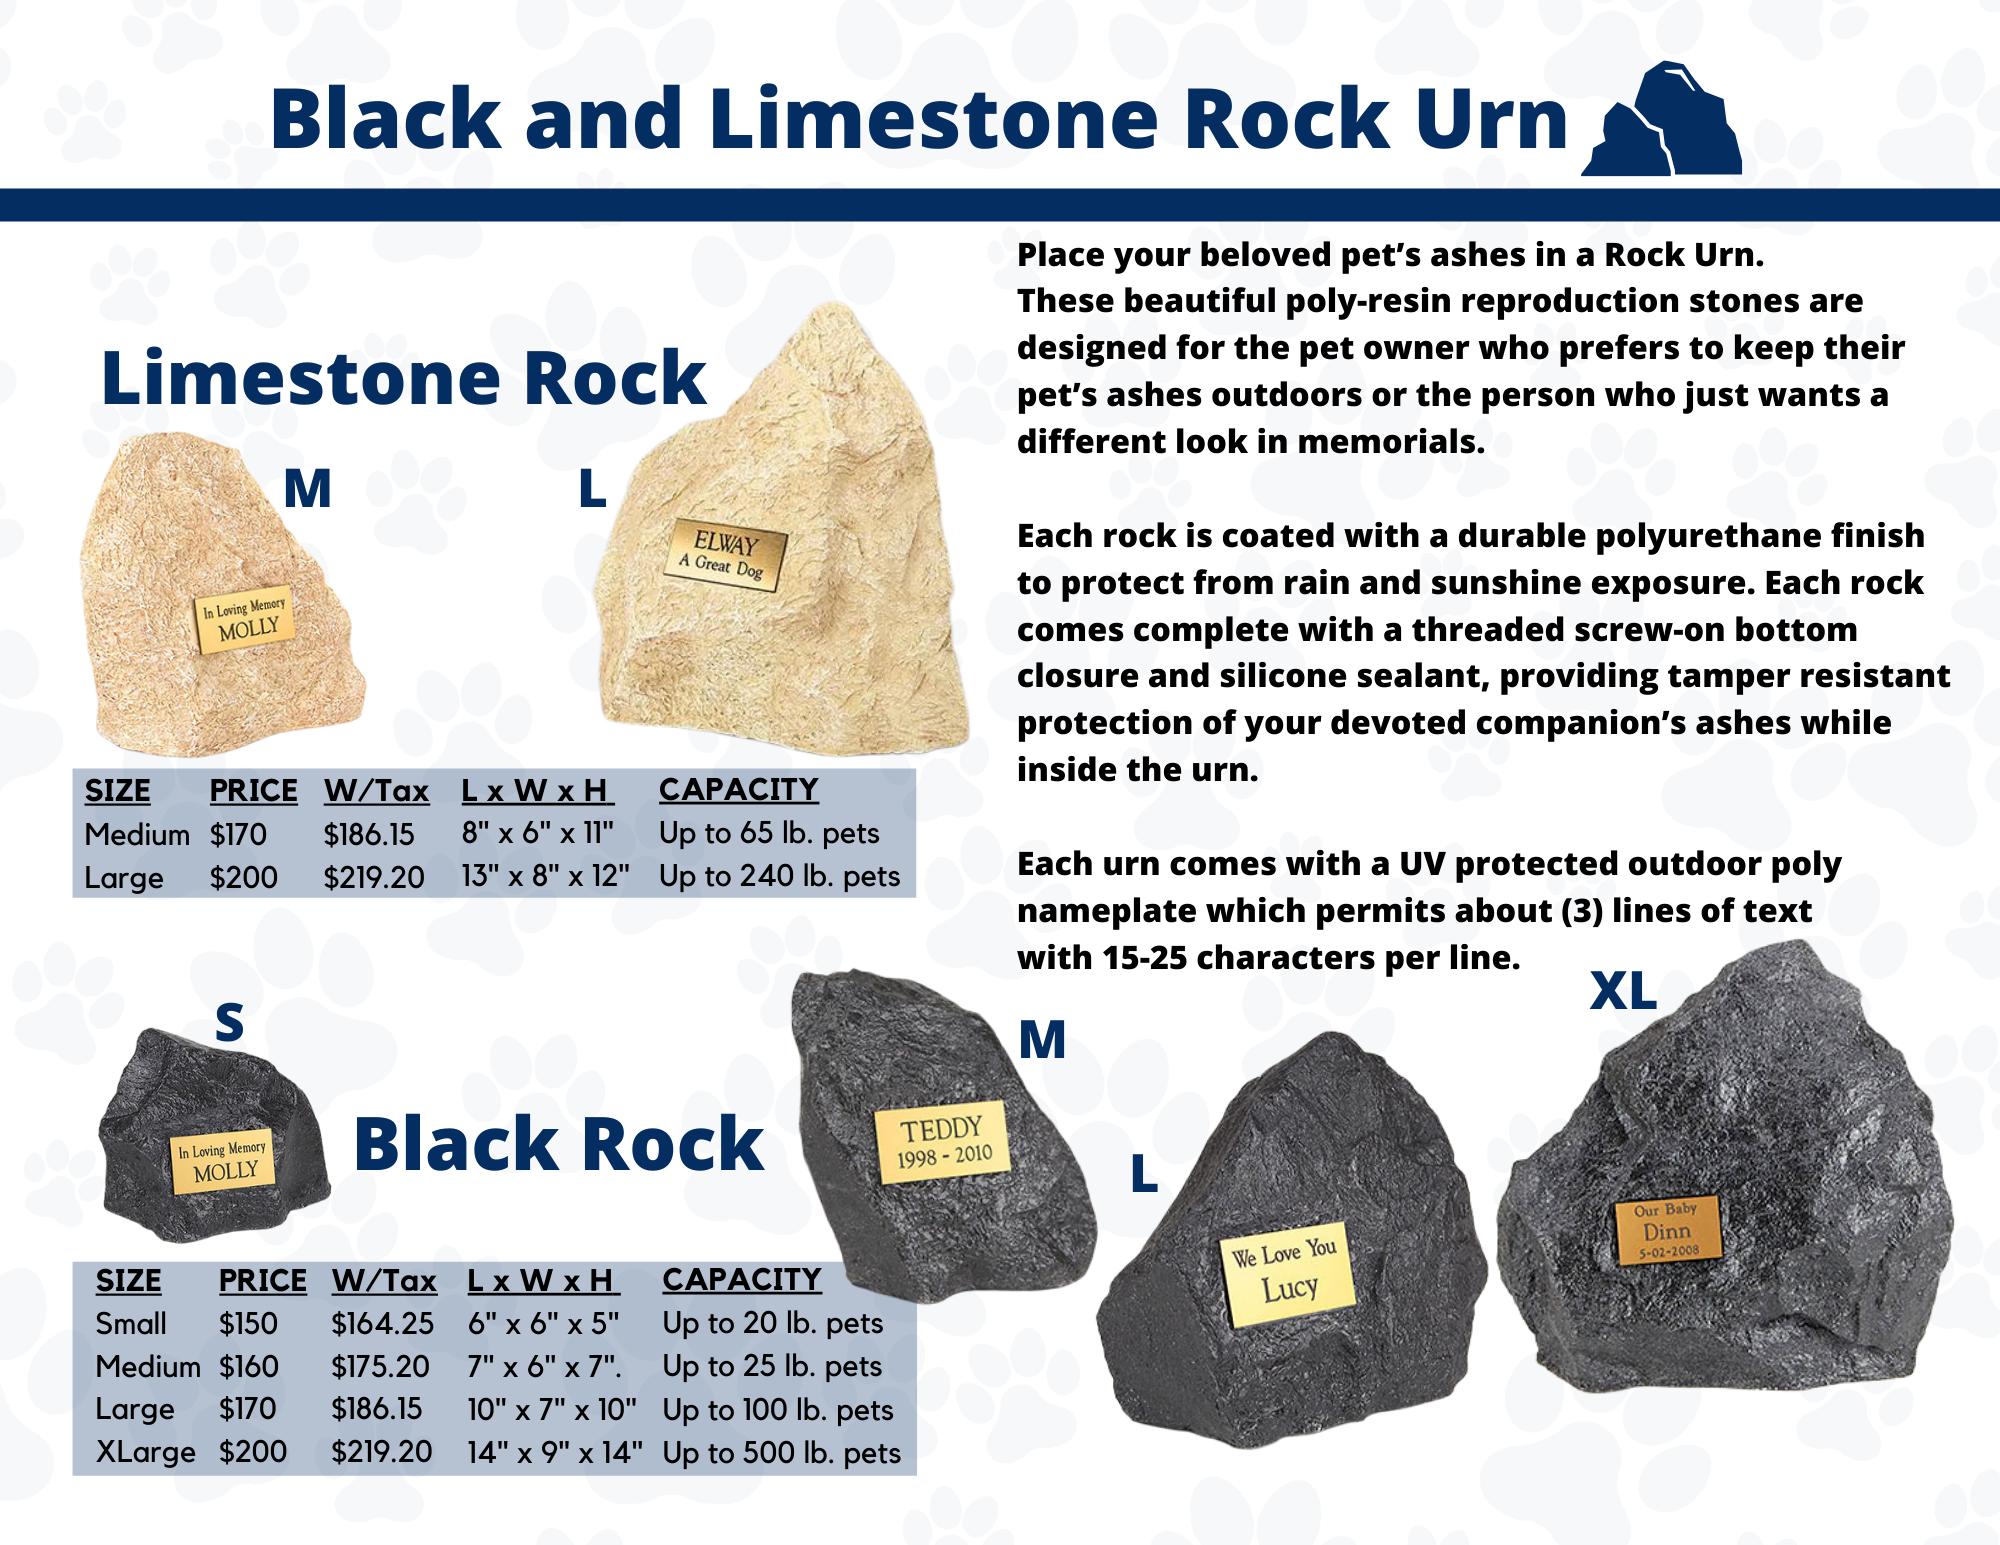 Limestone Rock Urn